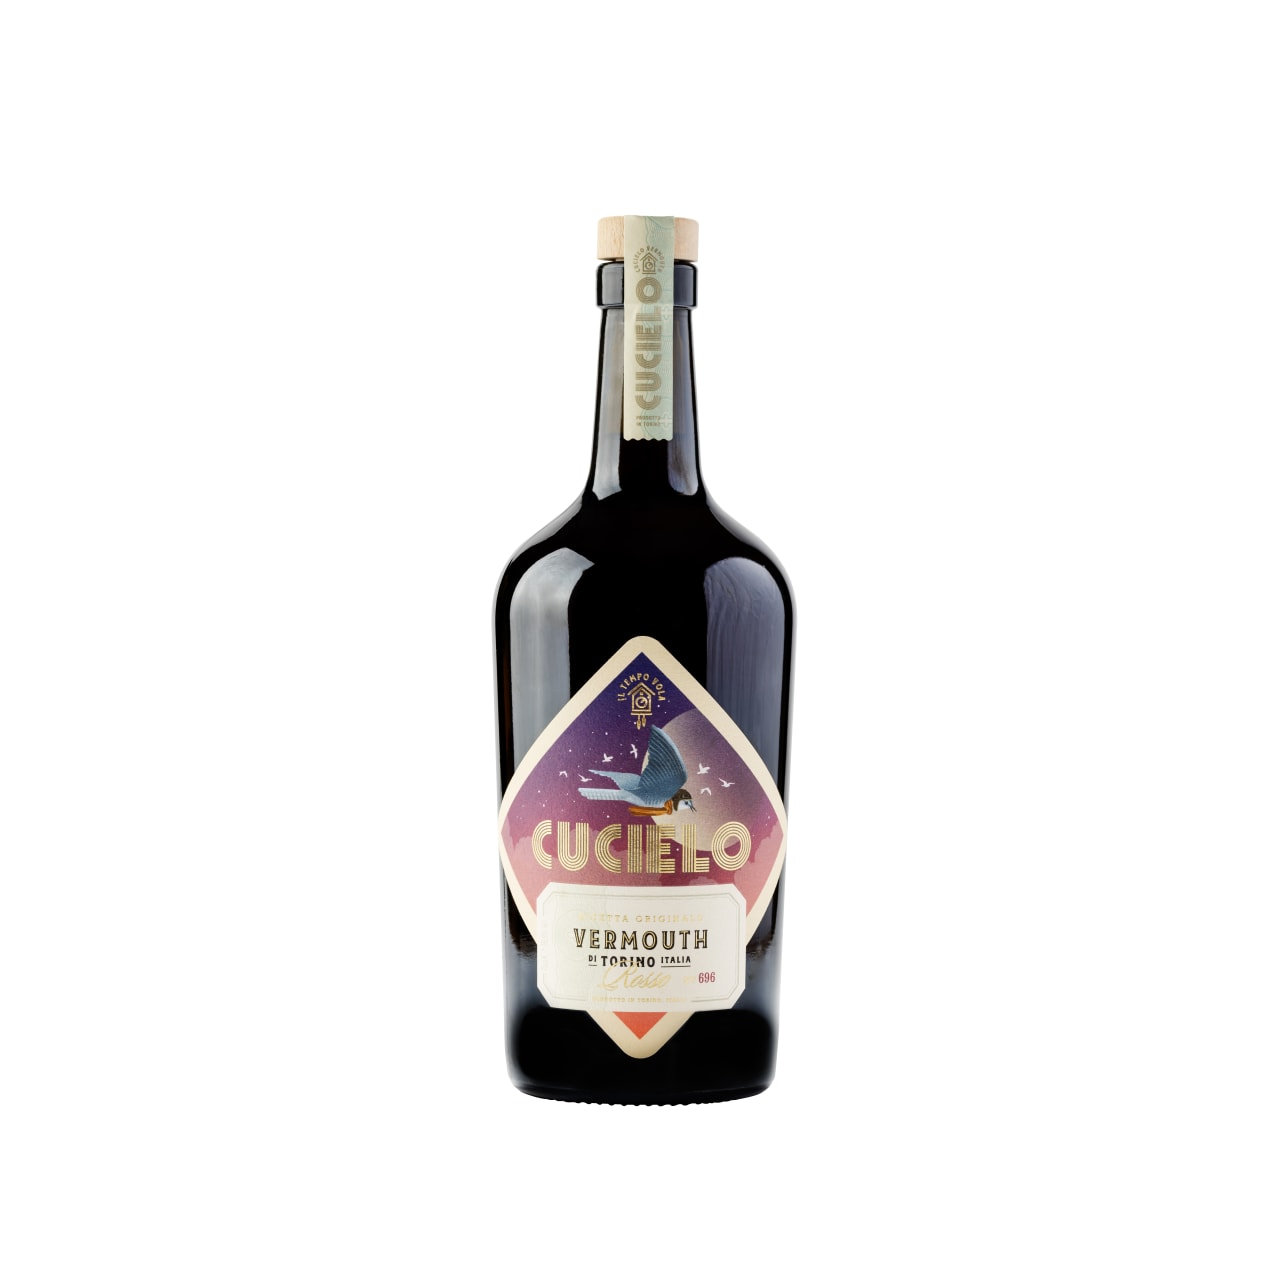 Product Image - CUCIELO Vermouth di Torino Rosso